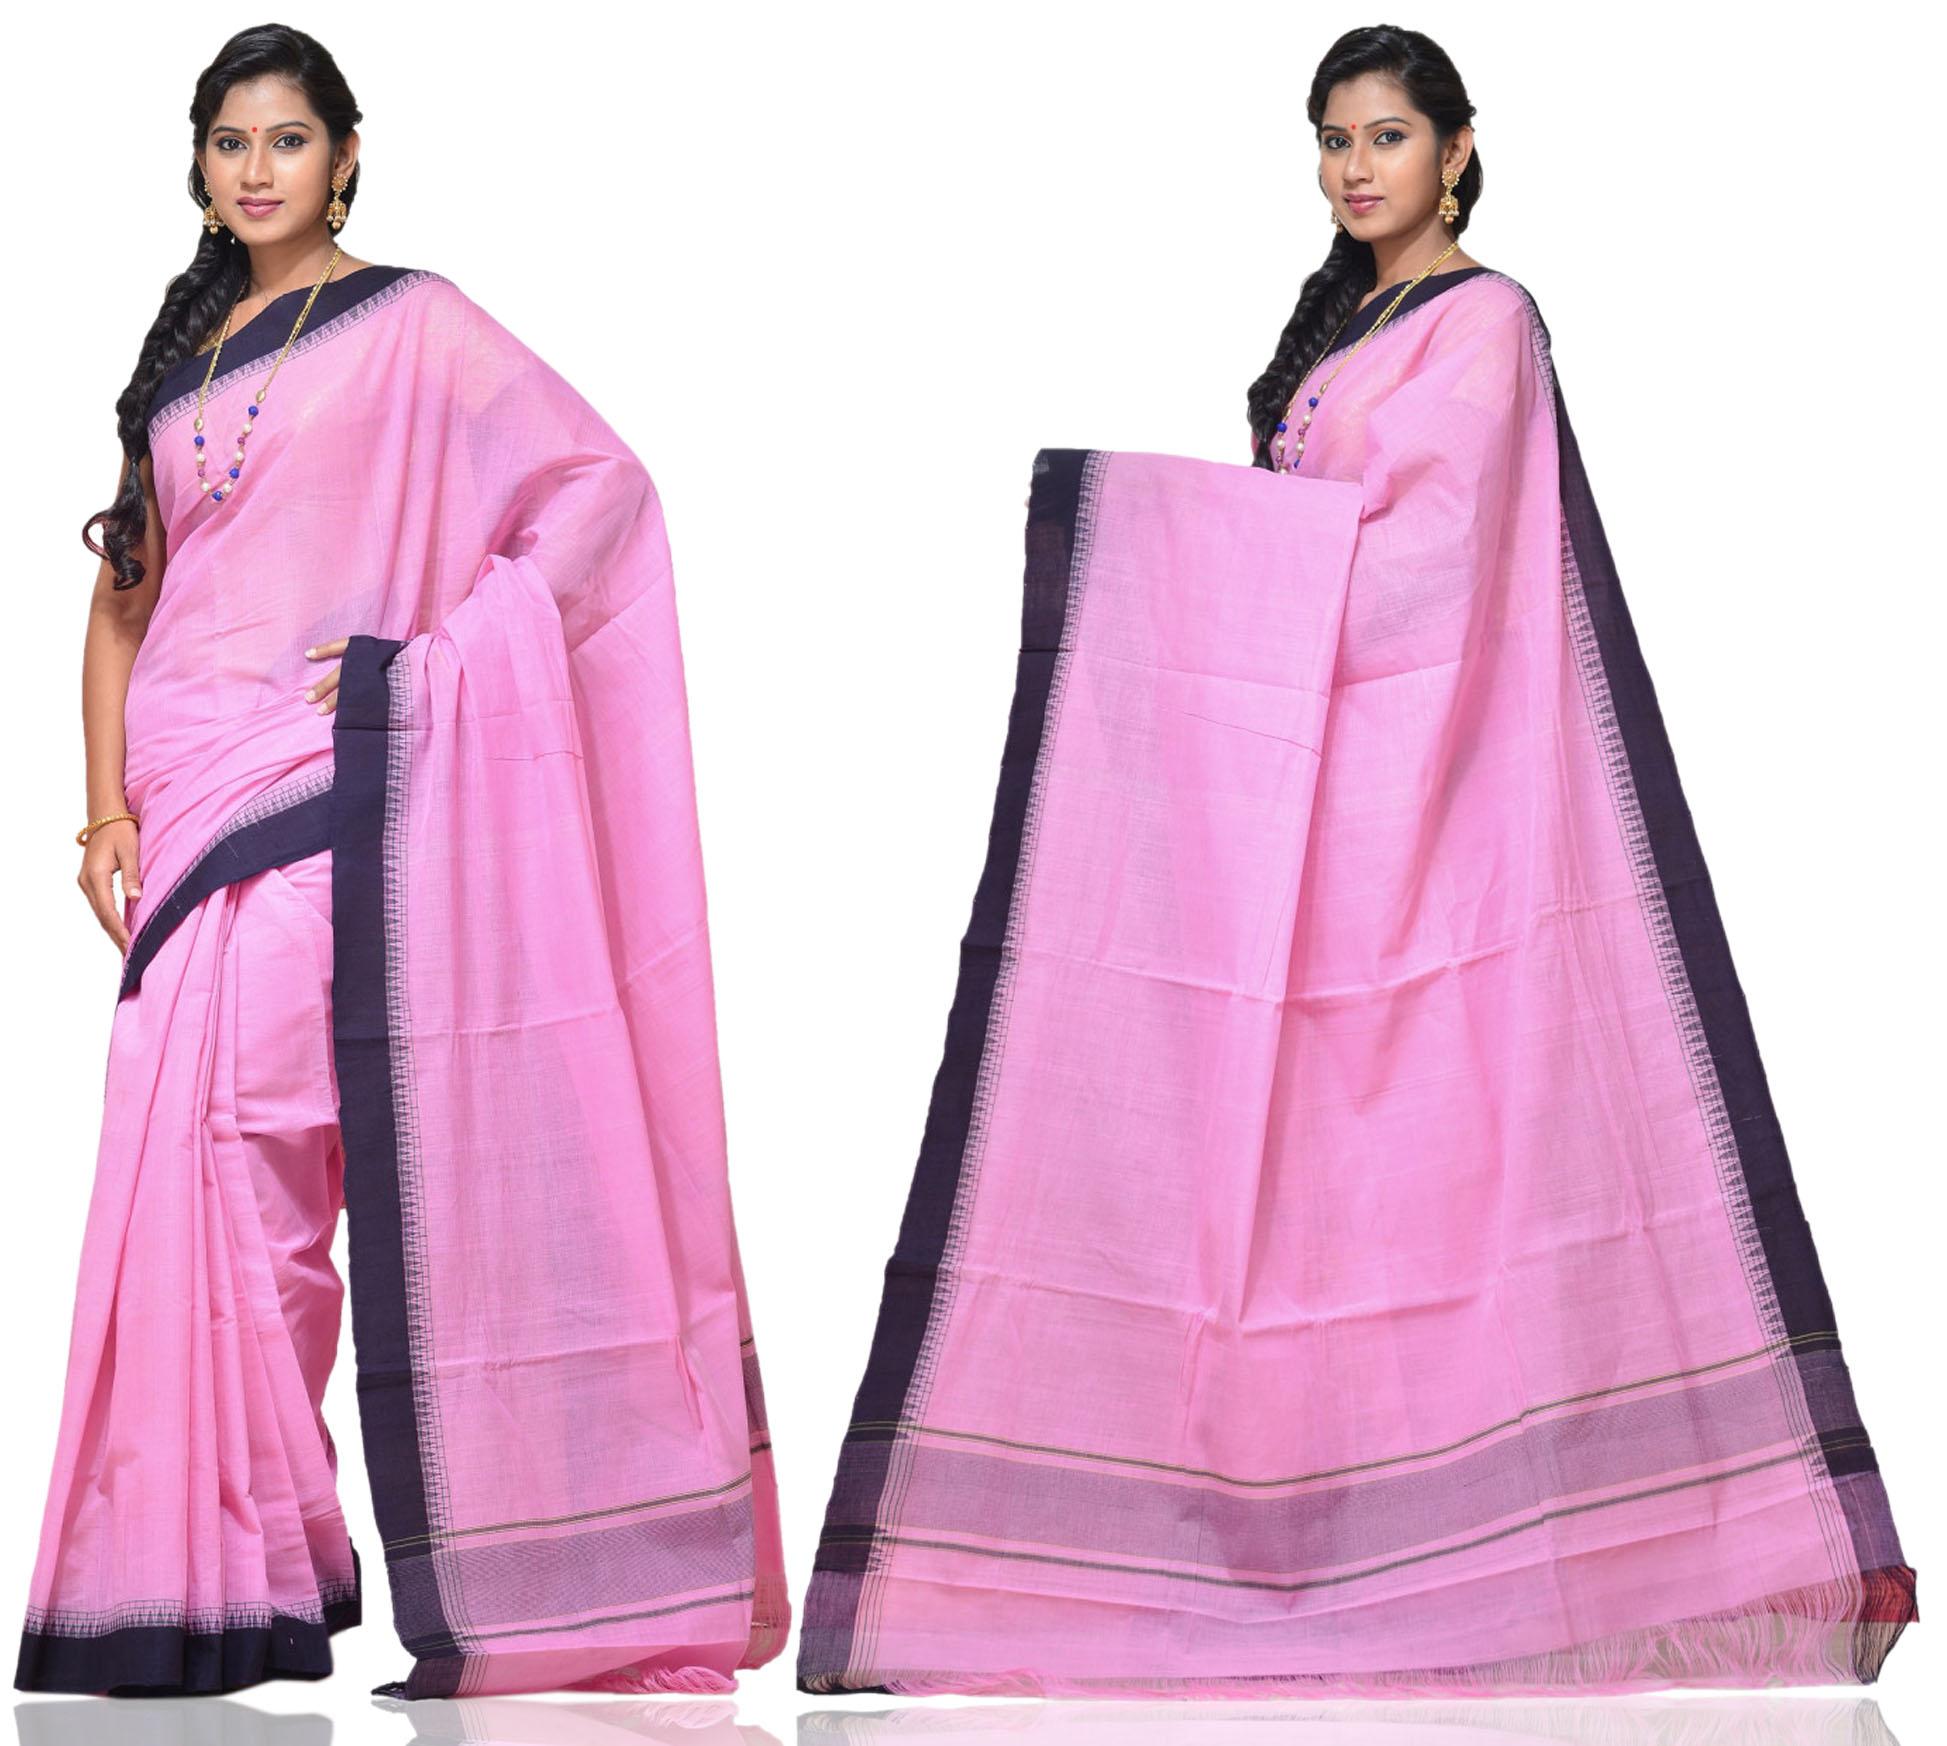 Price: - 6000/-   New designs of khadi sarees, khadi cotton silk sarees, khadi cotton fabric, khadi silk sarees. Sign up now for E-book you will be updated with latest collection of ethnic verities. For More Info Click on :- www.uppada.com  We manufacture of Uppada sarees, Paithani sarees, Banarasi sarees, Venkatagiri Sarees, Gadwal Sarees, Khadi sarees, Hand Painted Kalamkari Dupatta, Ikkat sarees, Kanchipuram Sarees, Atr Poly Silk Sarees, Dupattas, Stoles etc. For more info us at 040 64640303, 441905005.  Buy online: - uppada.com  - by Paithani, Hyderabad